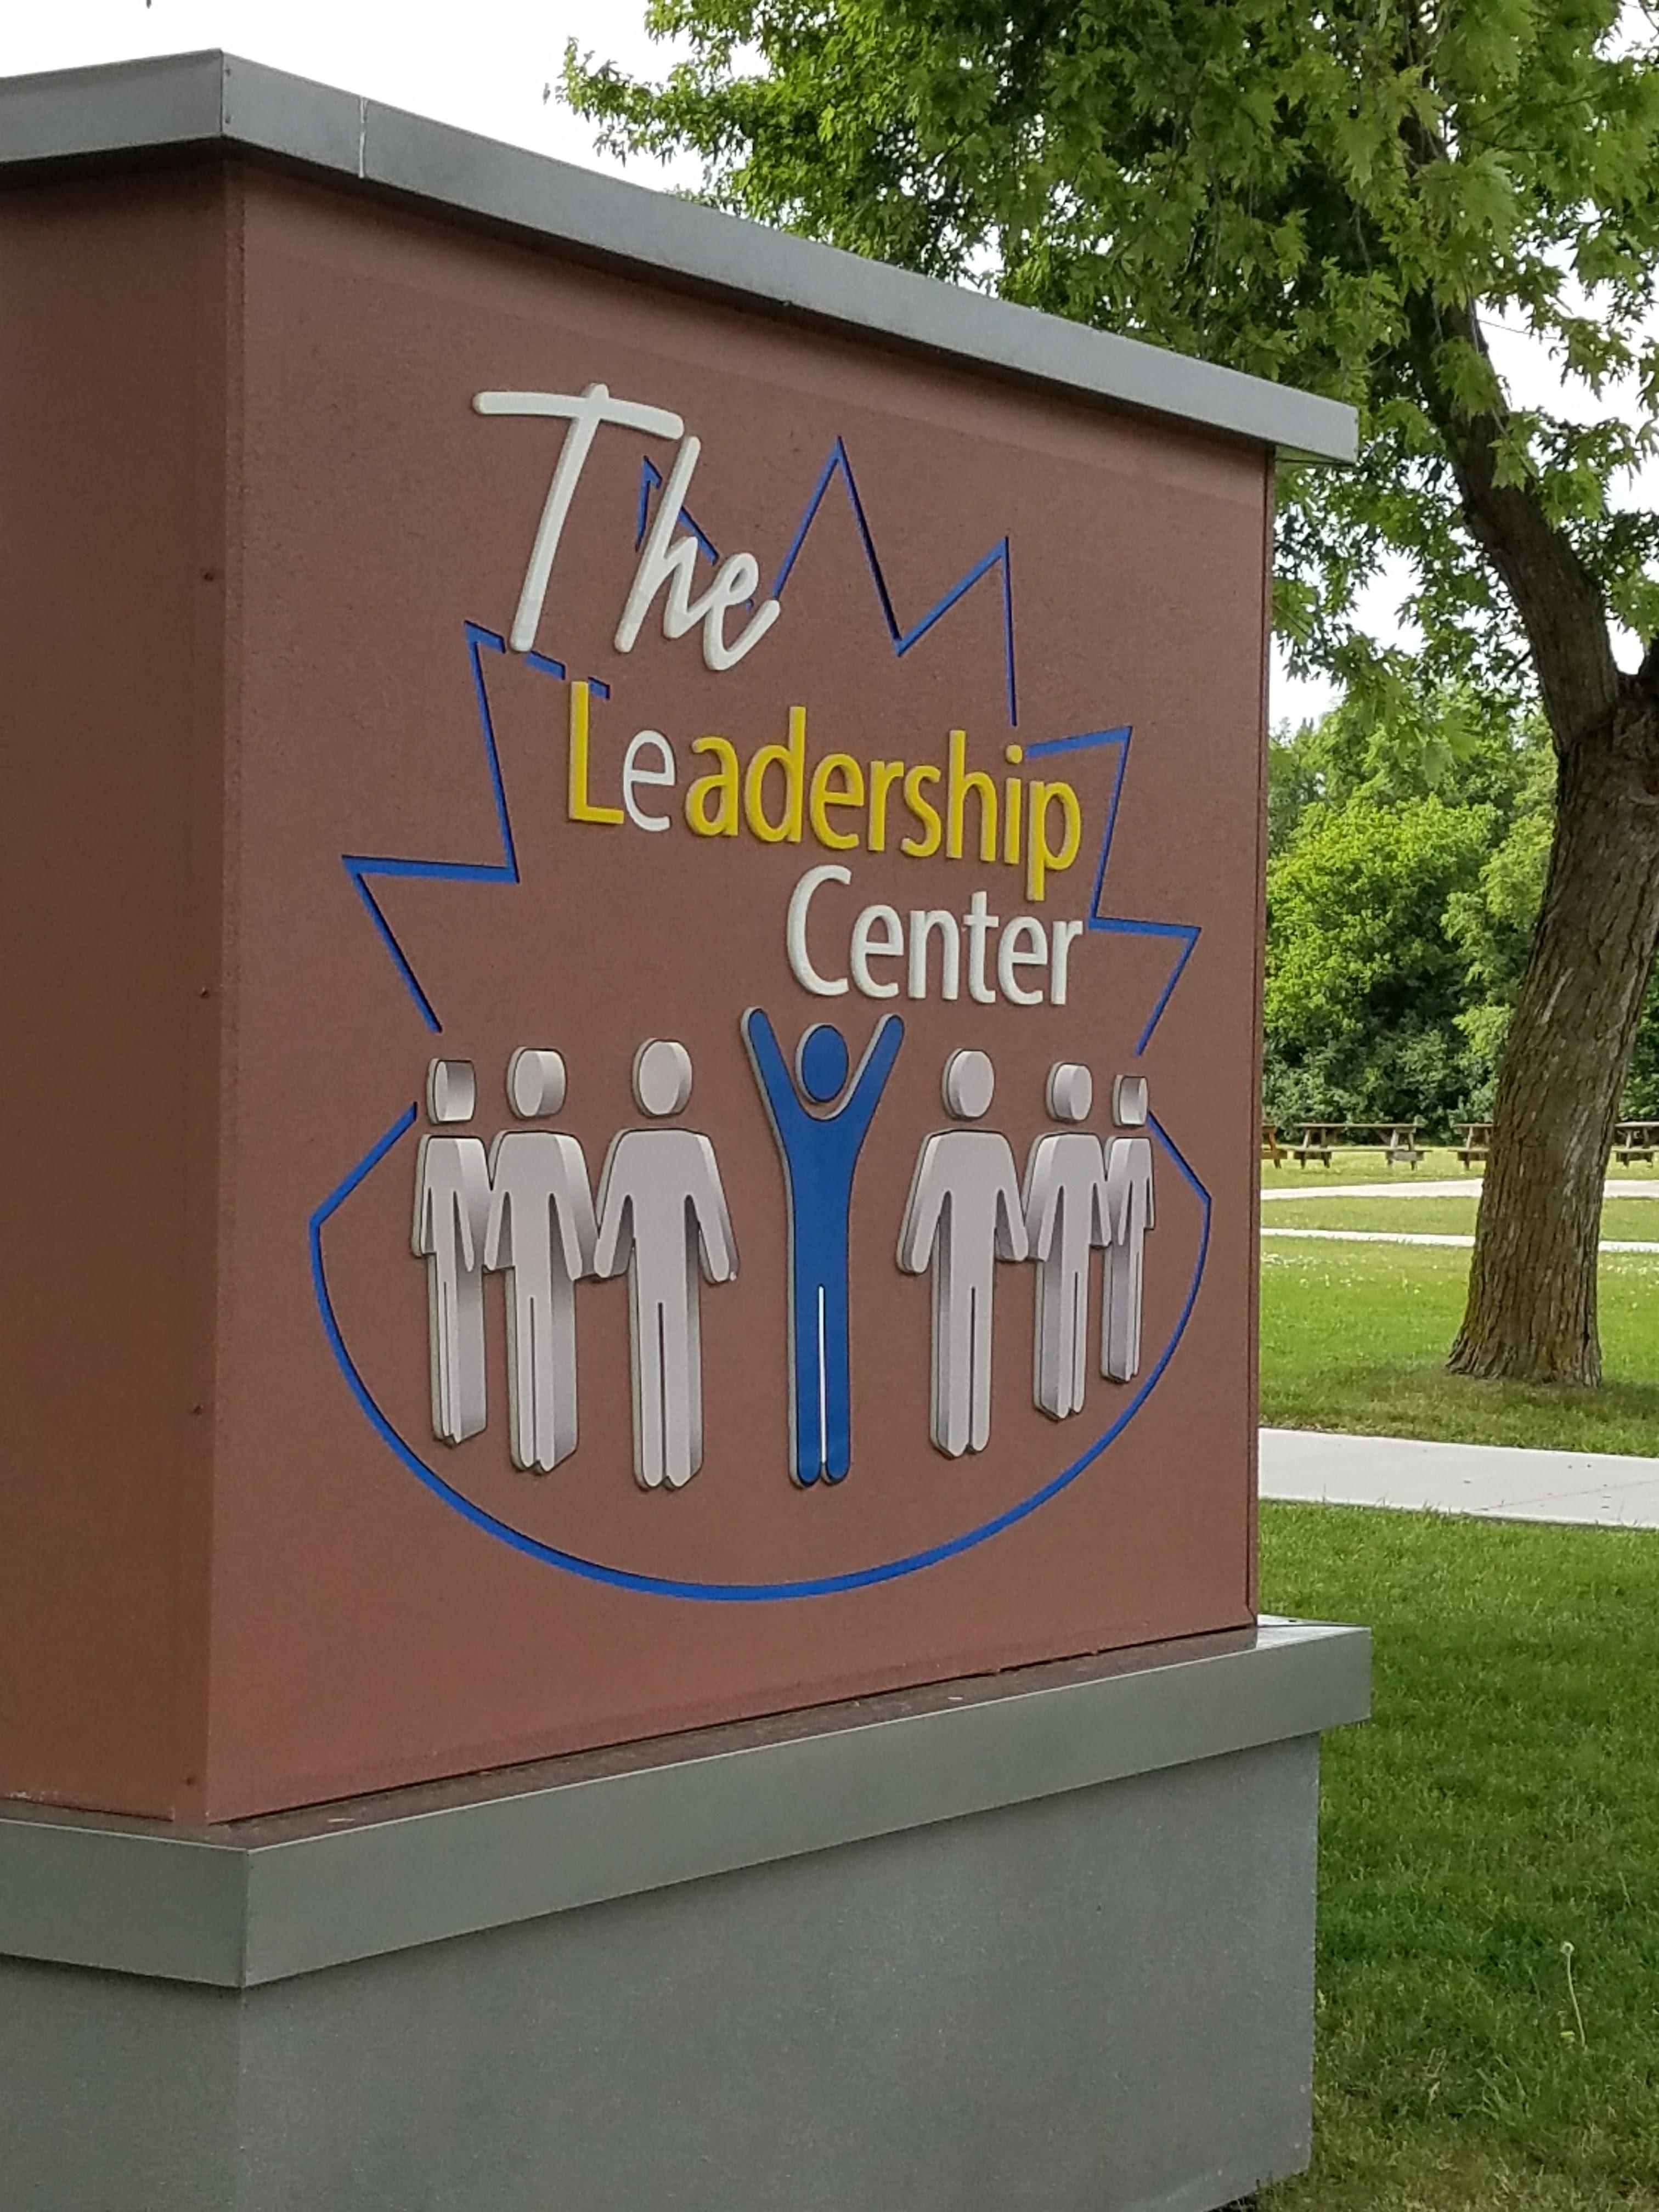 The Leadership Center